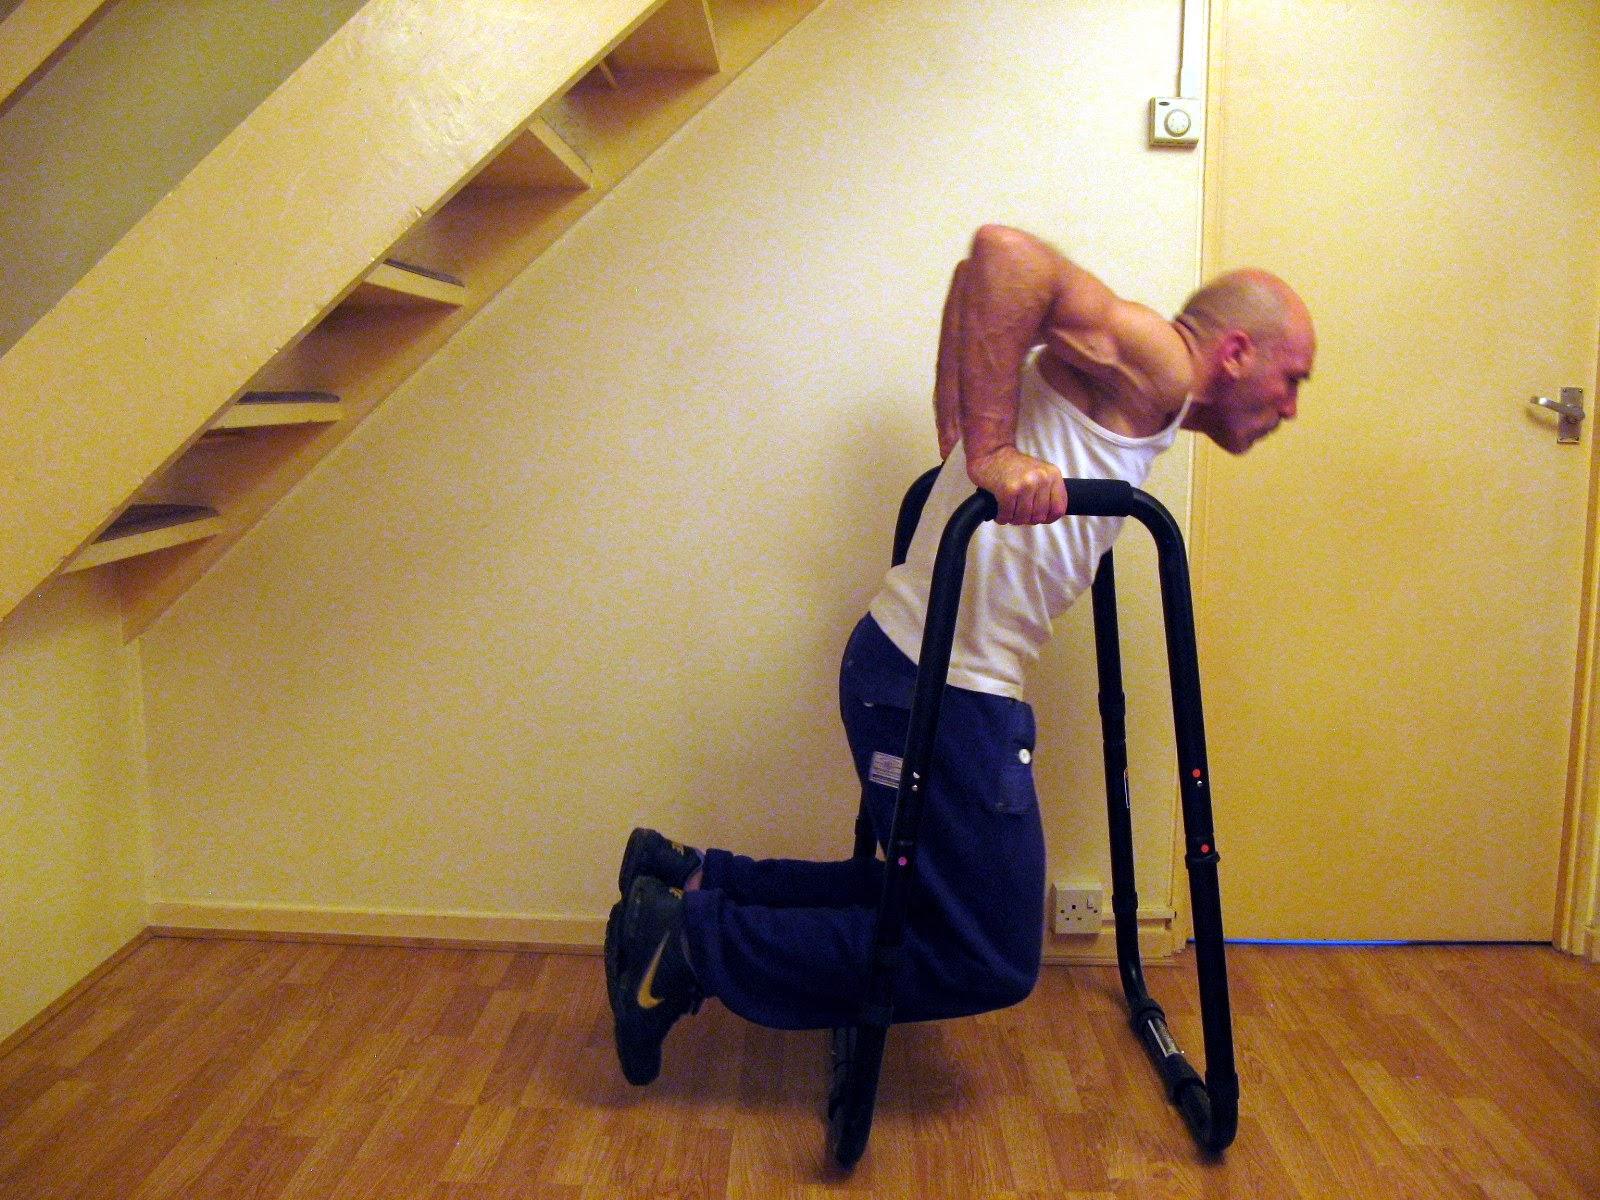 Start Bodyweight Training Dip Progression